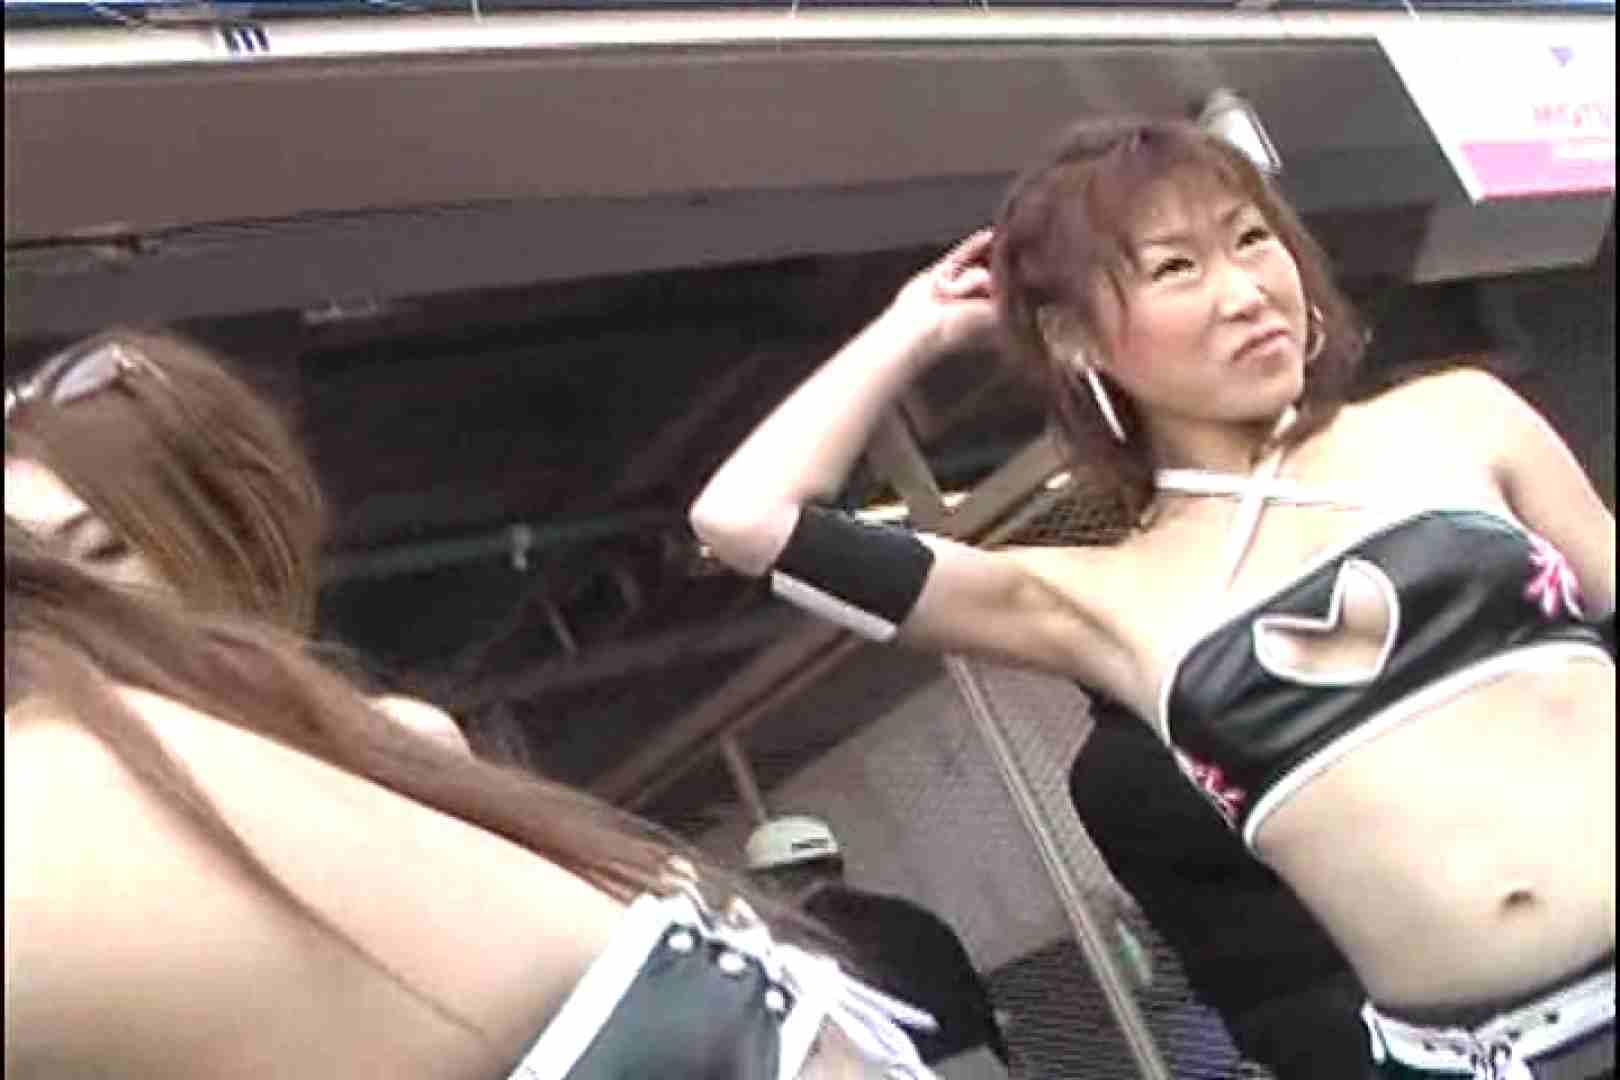 RQカメラ地獄Vol.10 乳首ポロリ 盗撮戯れ無修正画像 68画像 14